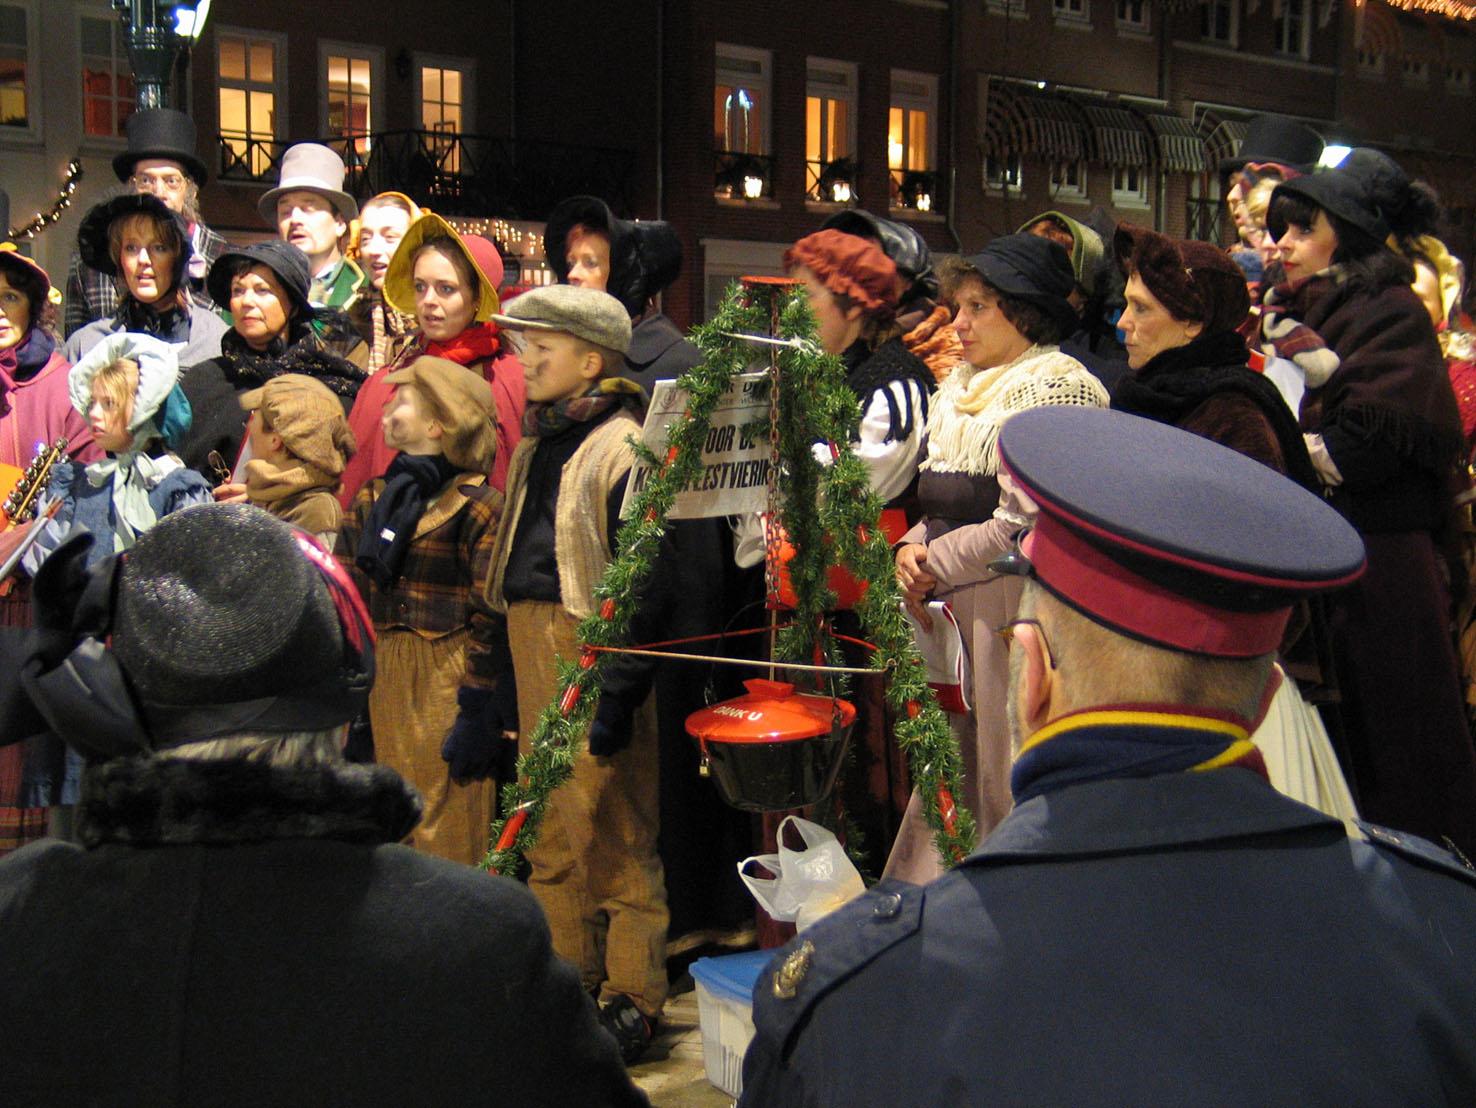 140 - Kerstmarkt Helmond 2003.jpg